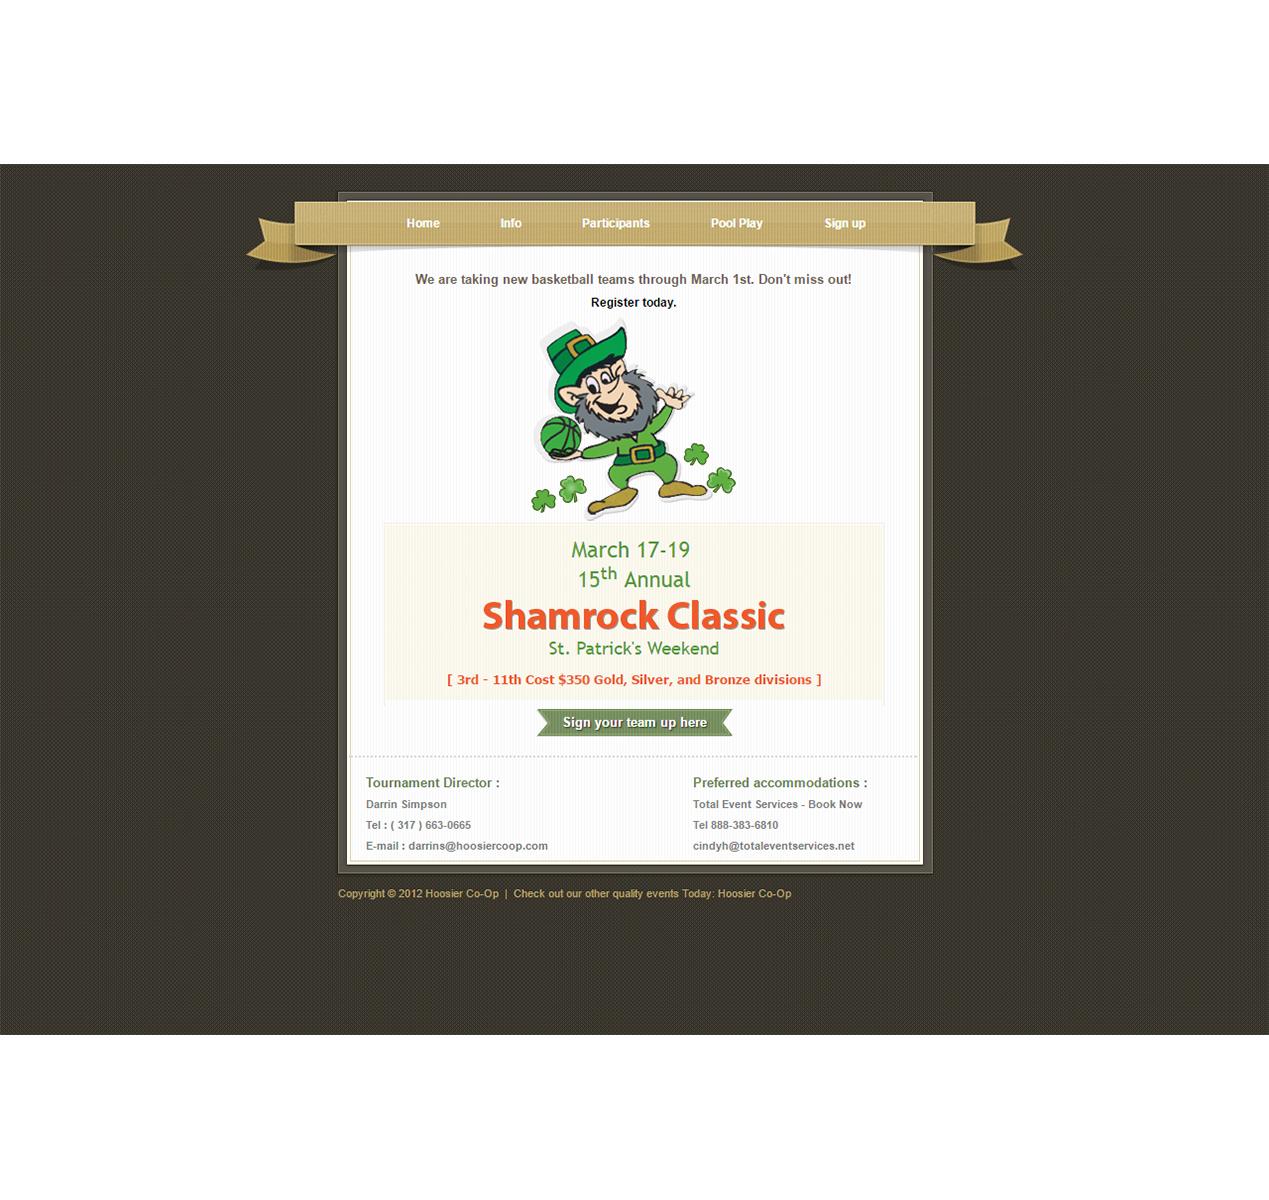 Shamrock Classic